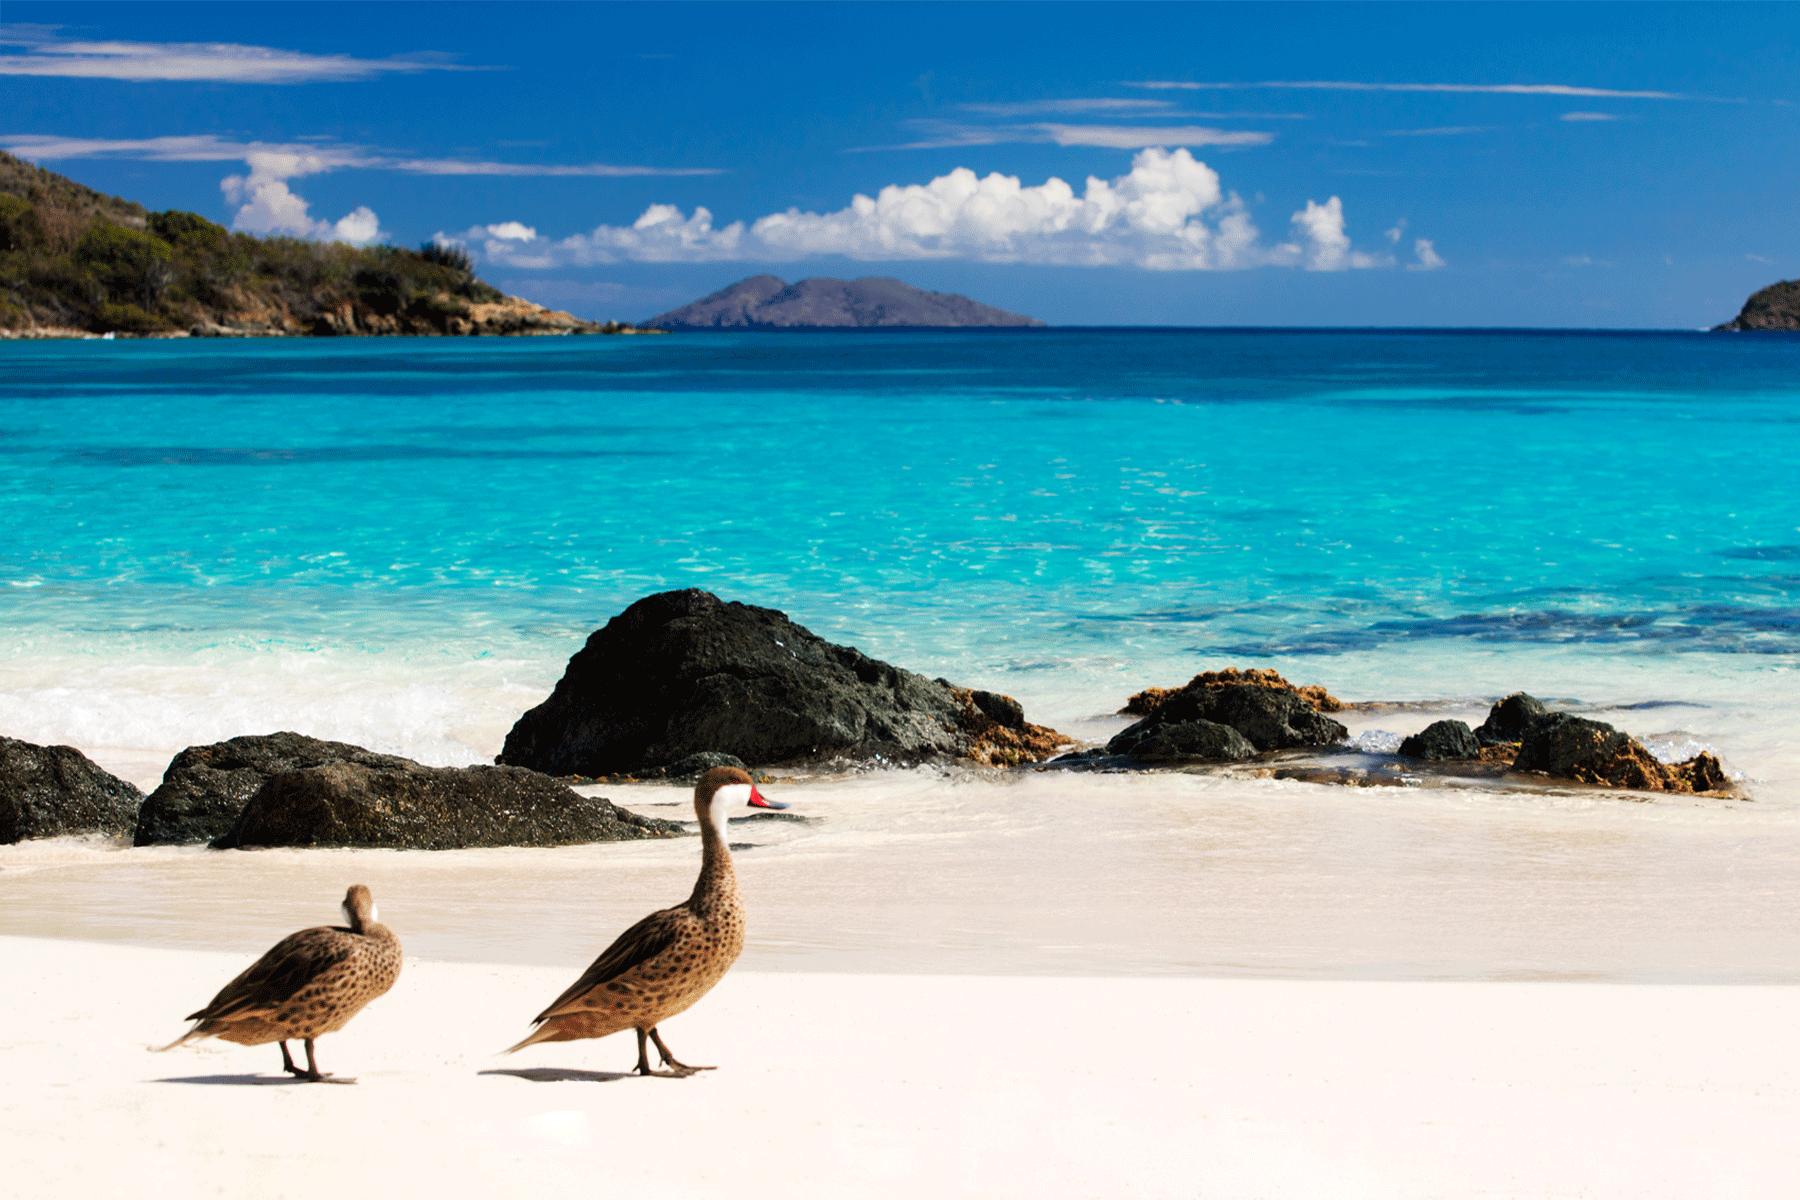 water-fowl-USVI-beach-caribbean